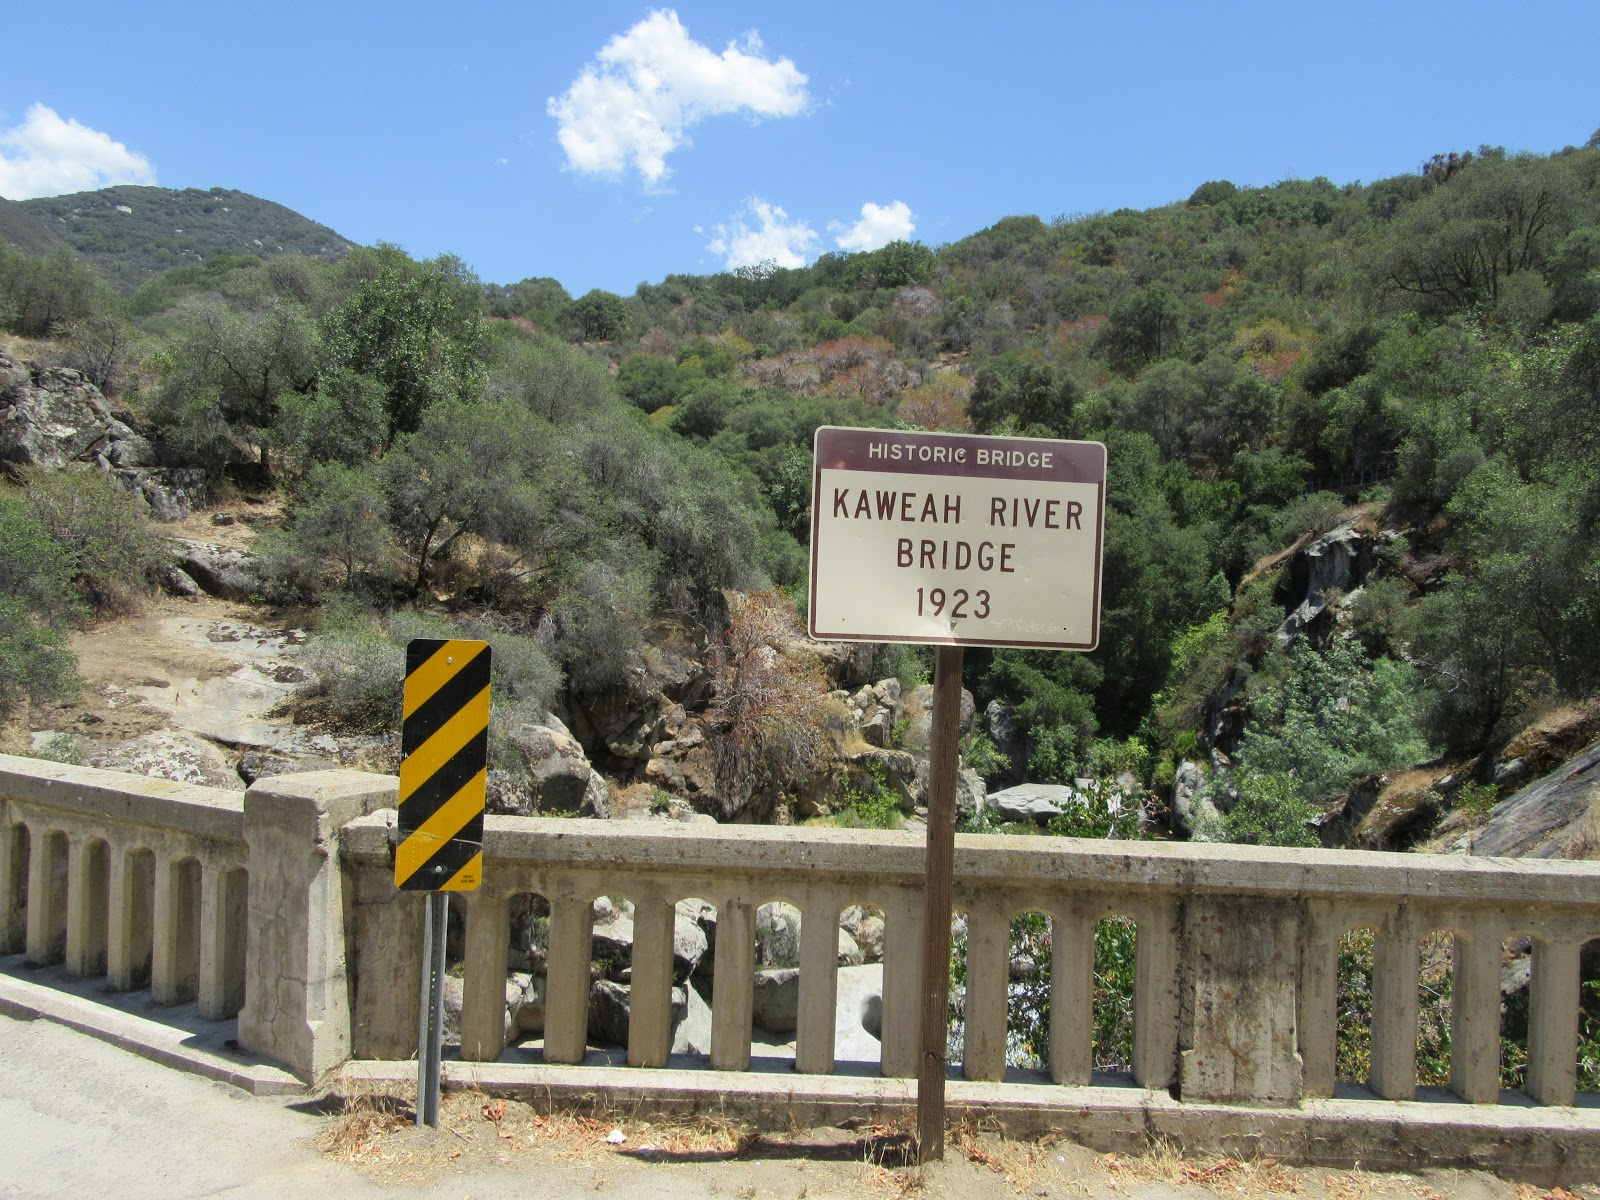 Kaweah River Bridge sign seen while bicycling Mineral King Road.